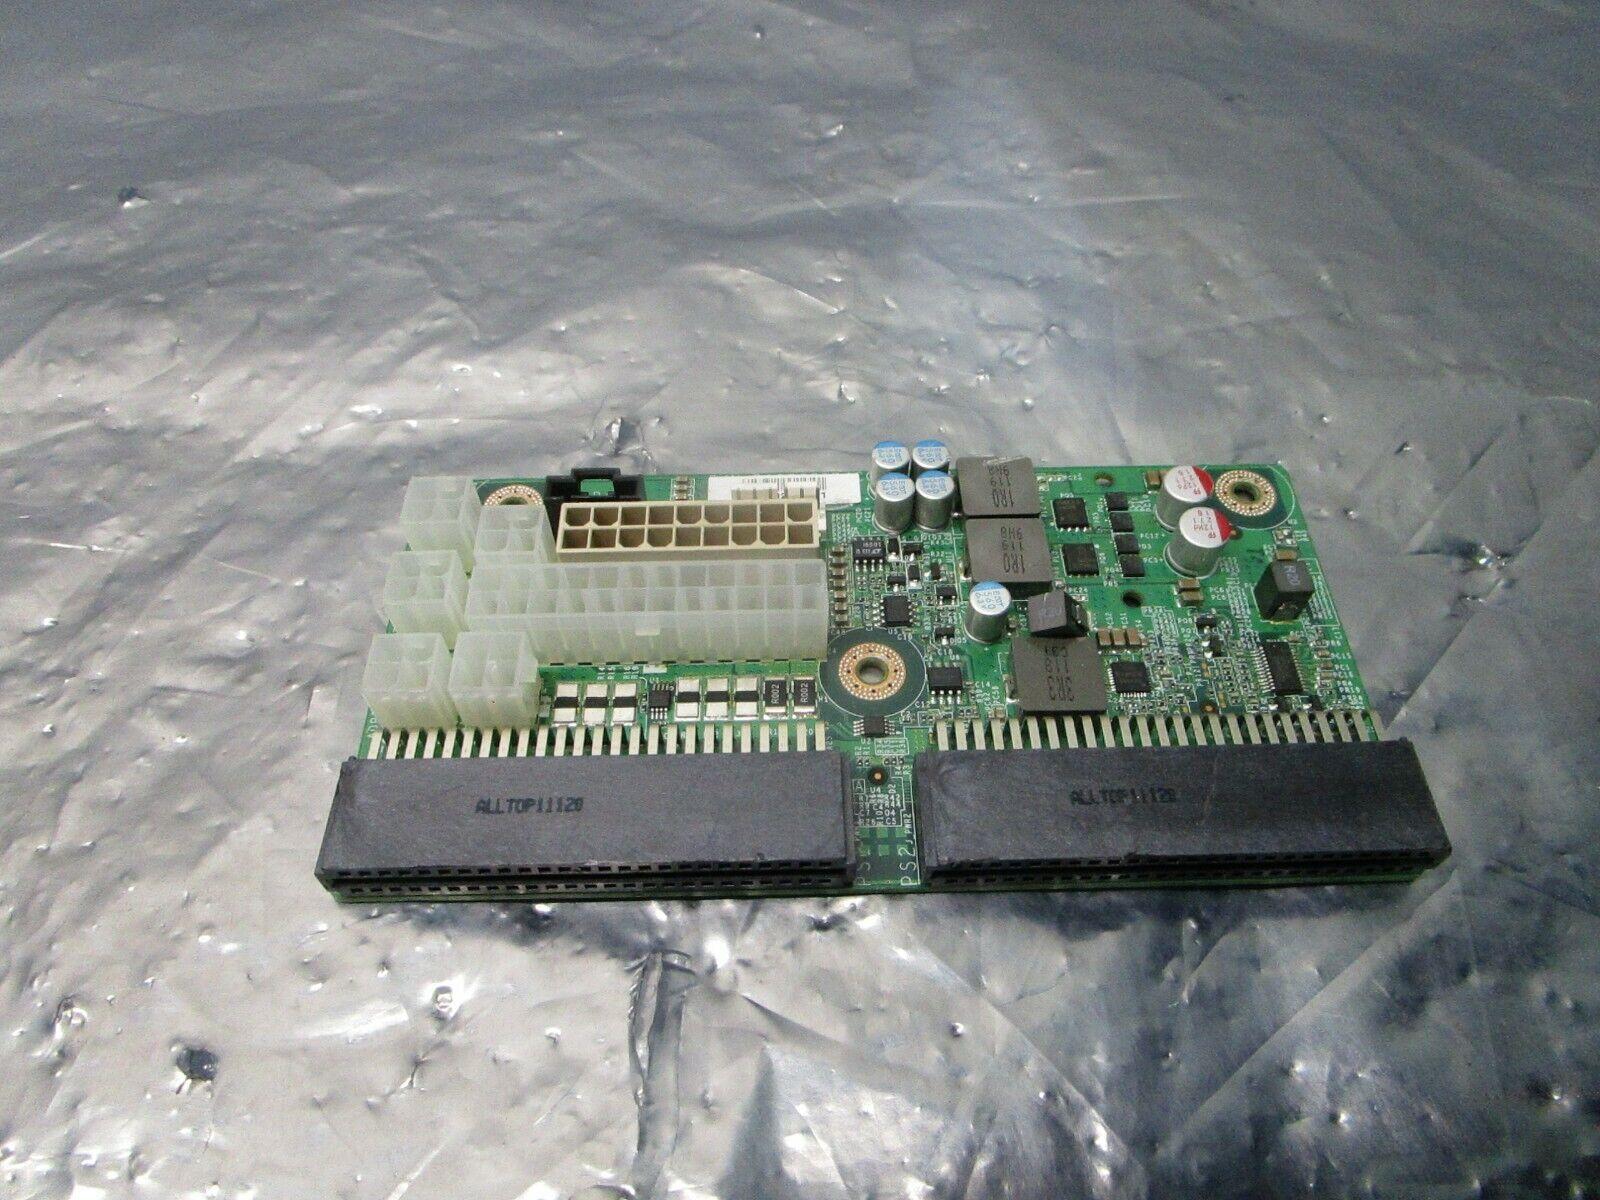 Intel DA0S6CTB4C0 Backplane Board, PCB, PBA G15585-301, 101534